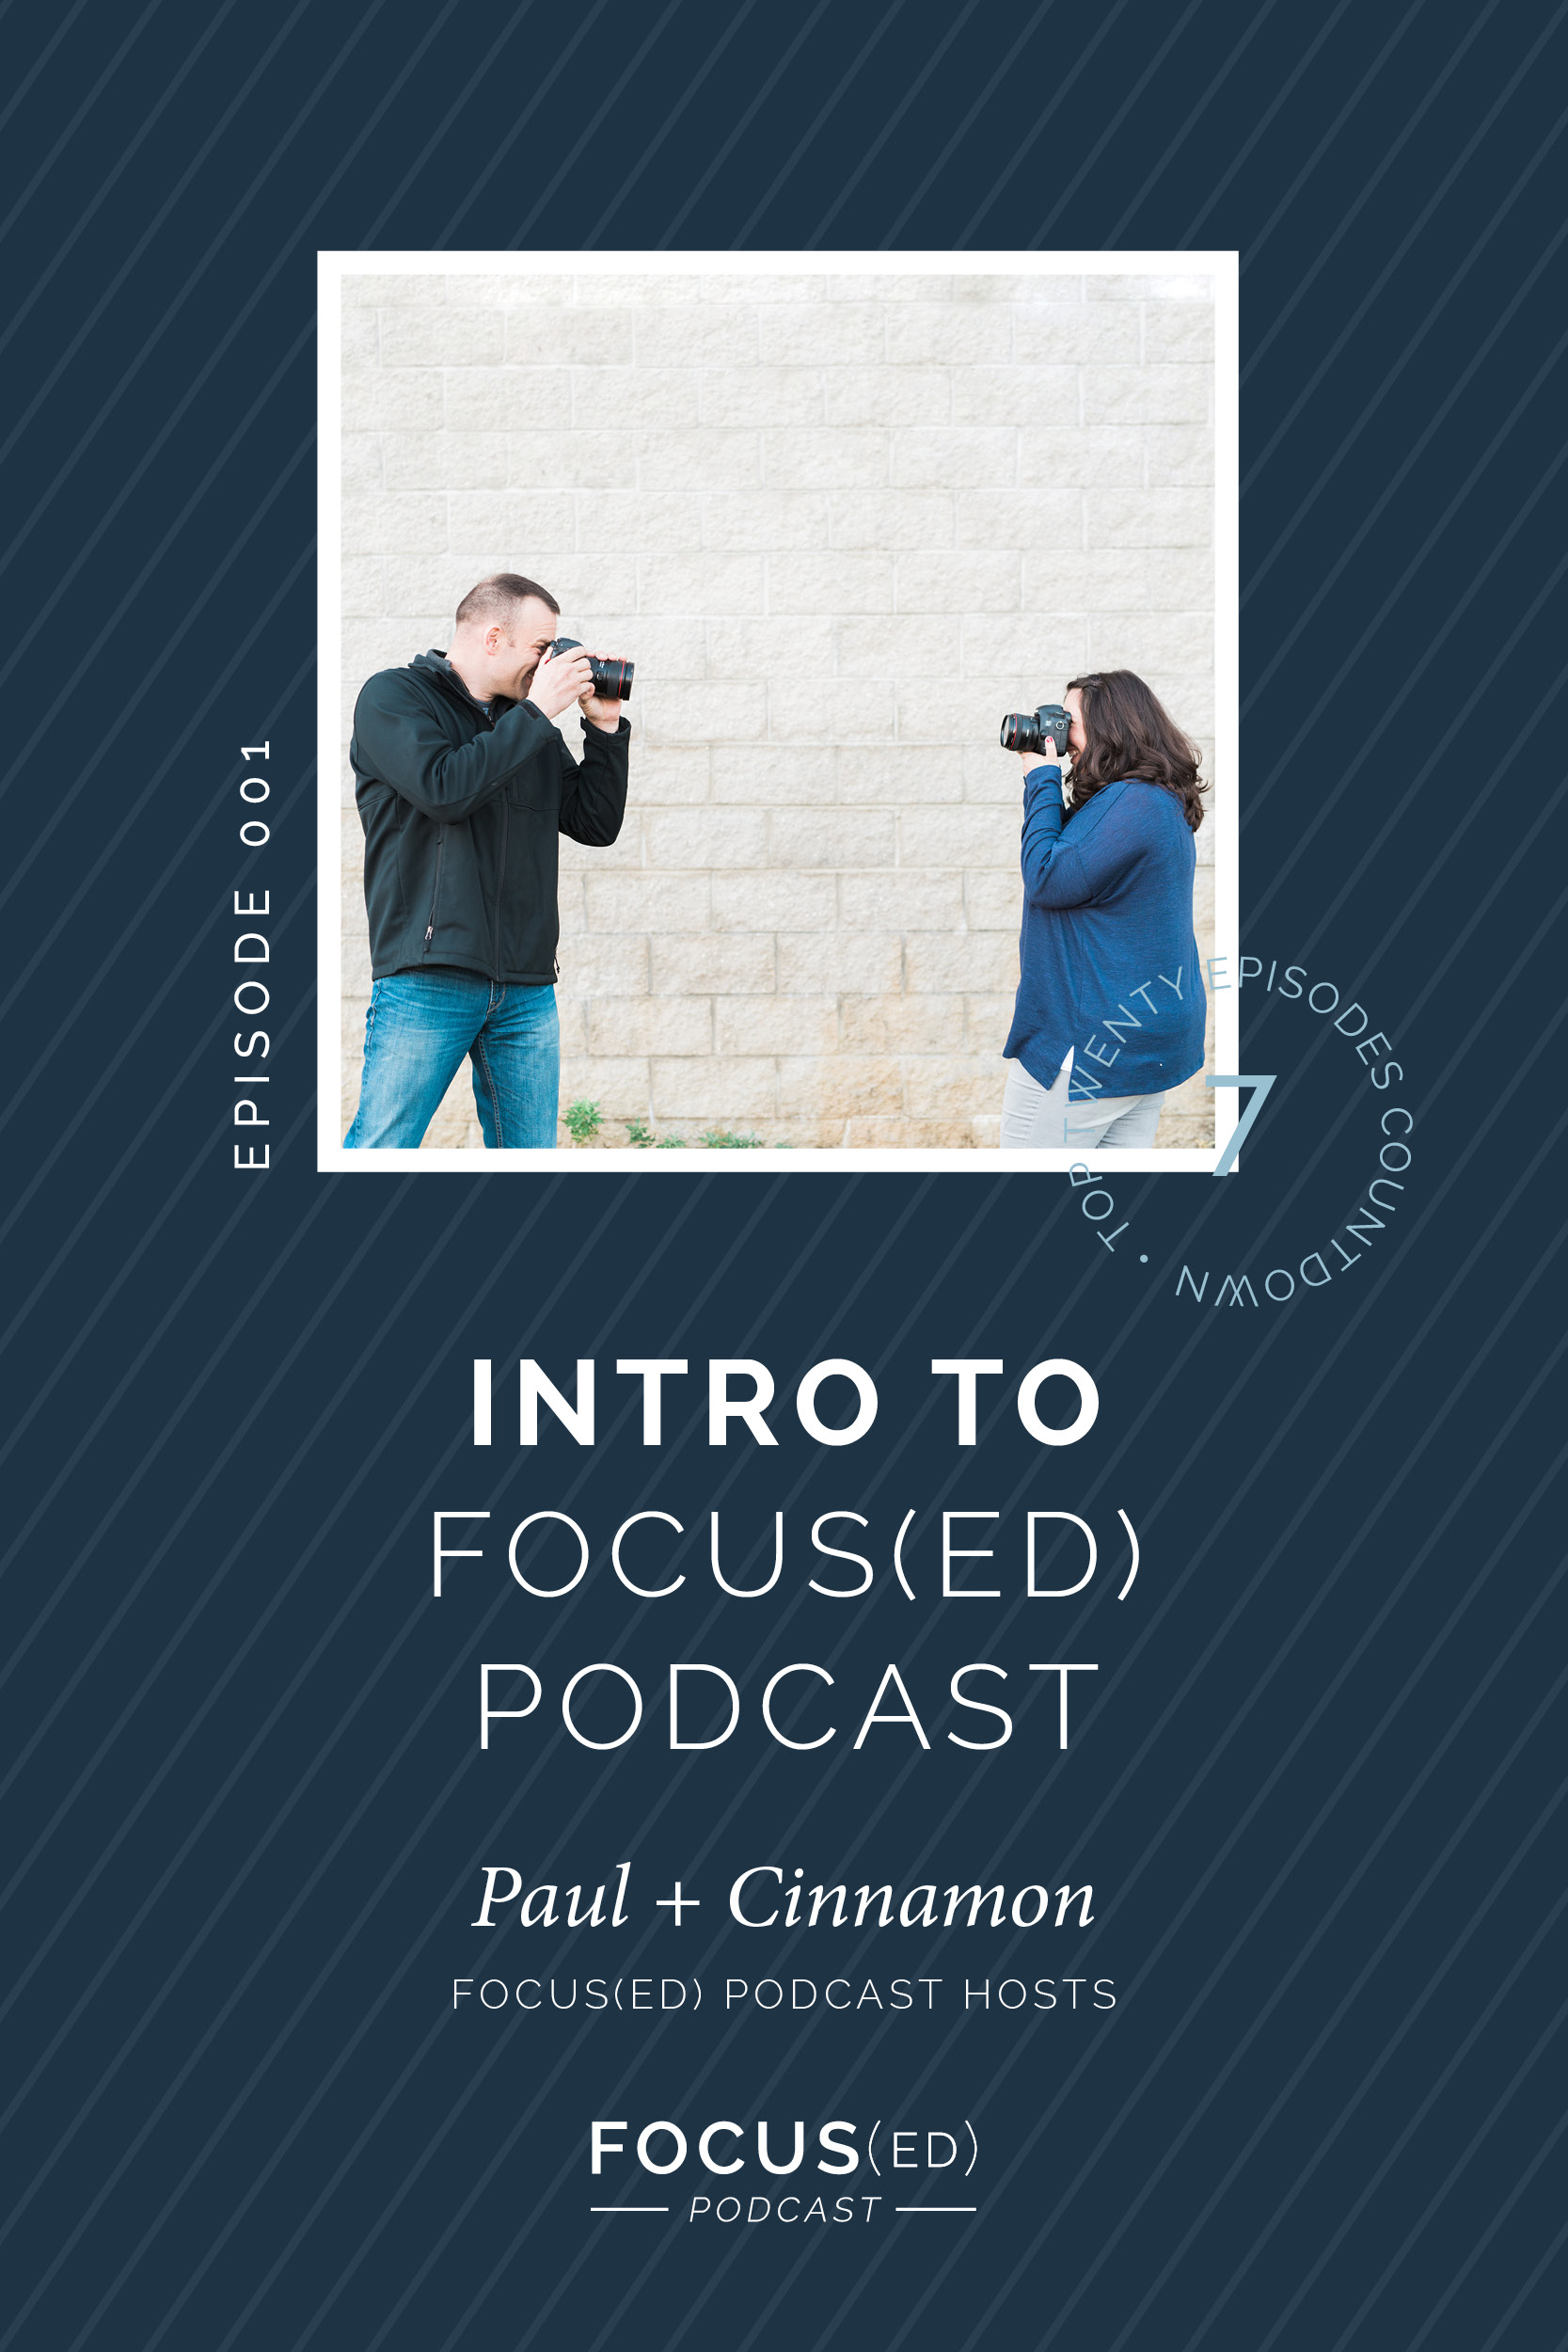 Top 20: #7 Intro to Focus(ed) Podcast, Paul & Cinnamon